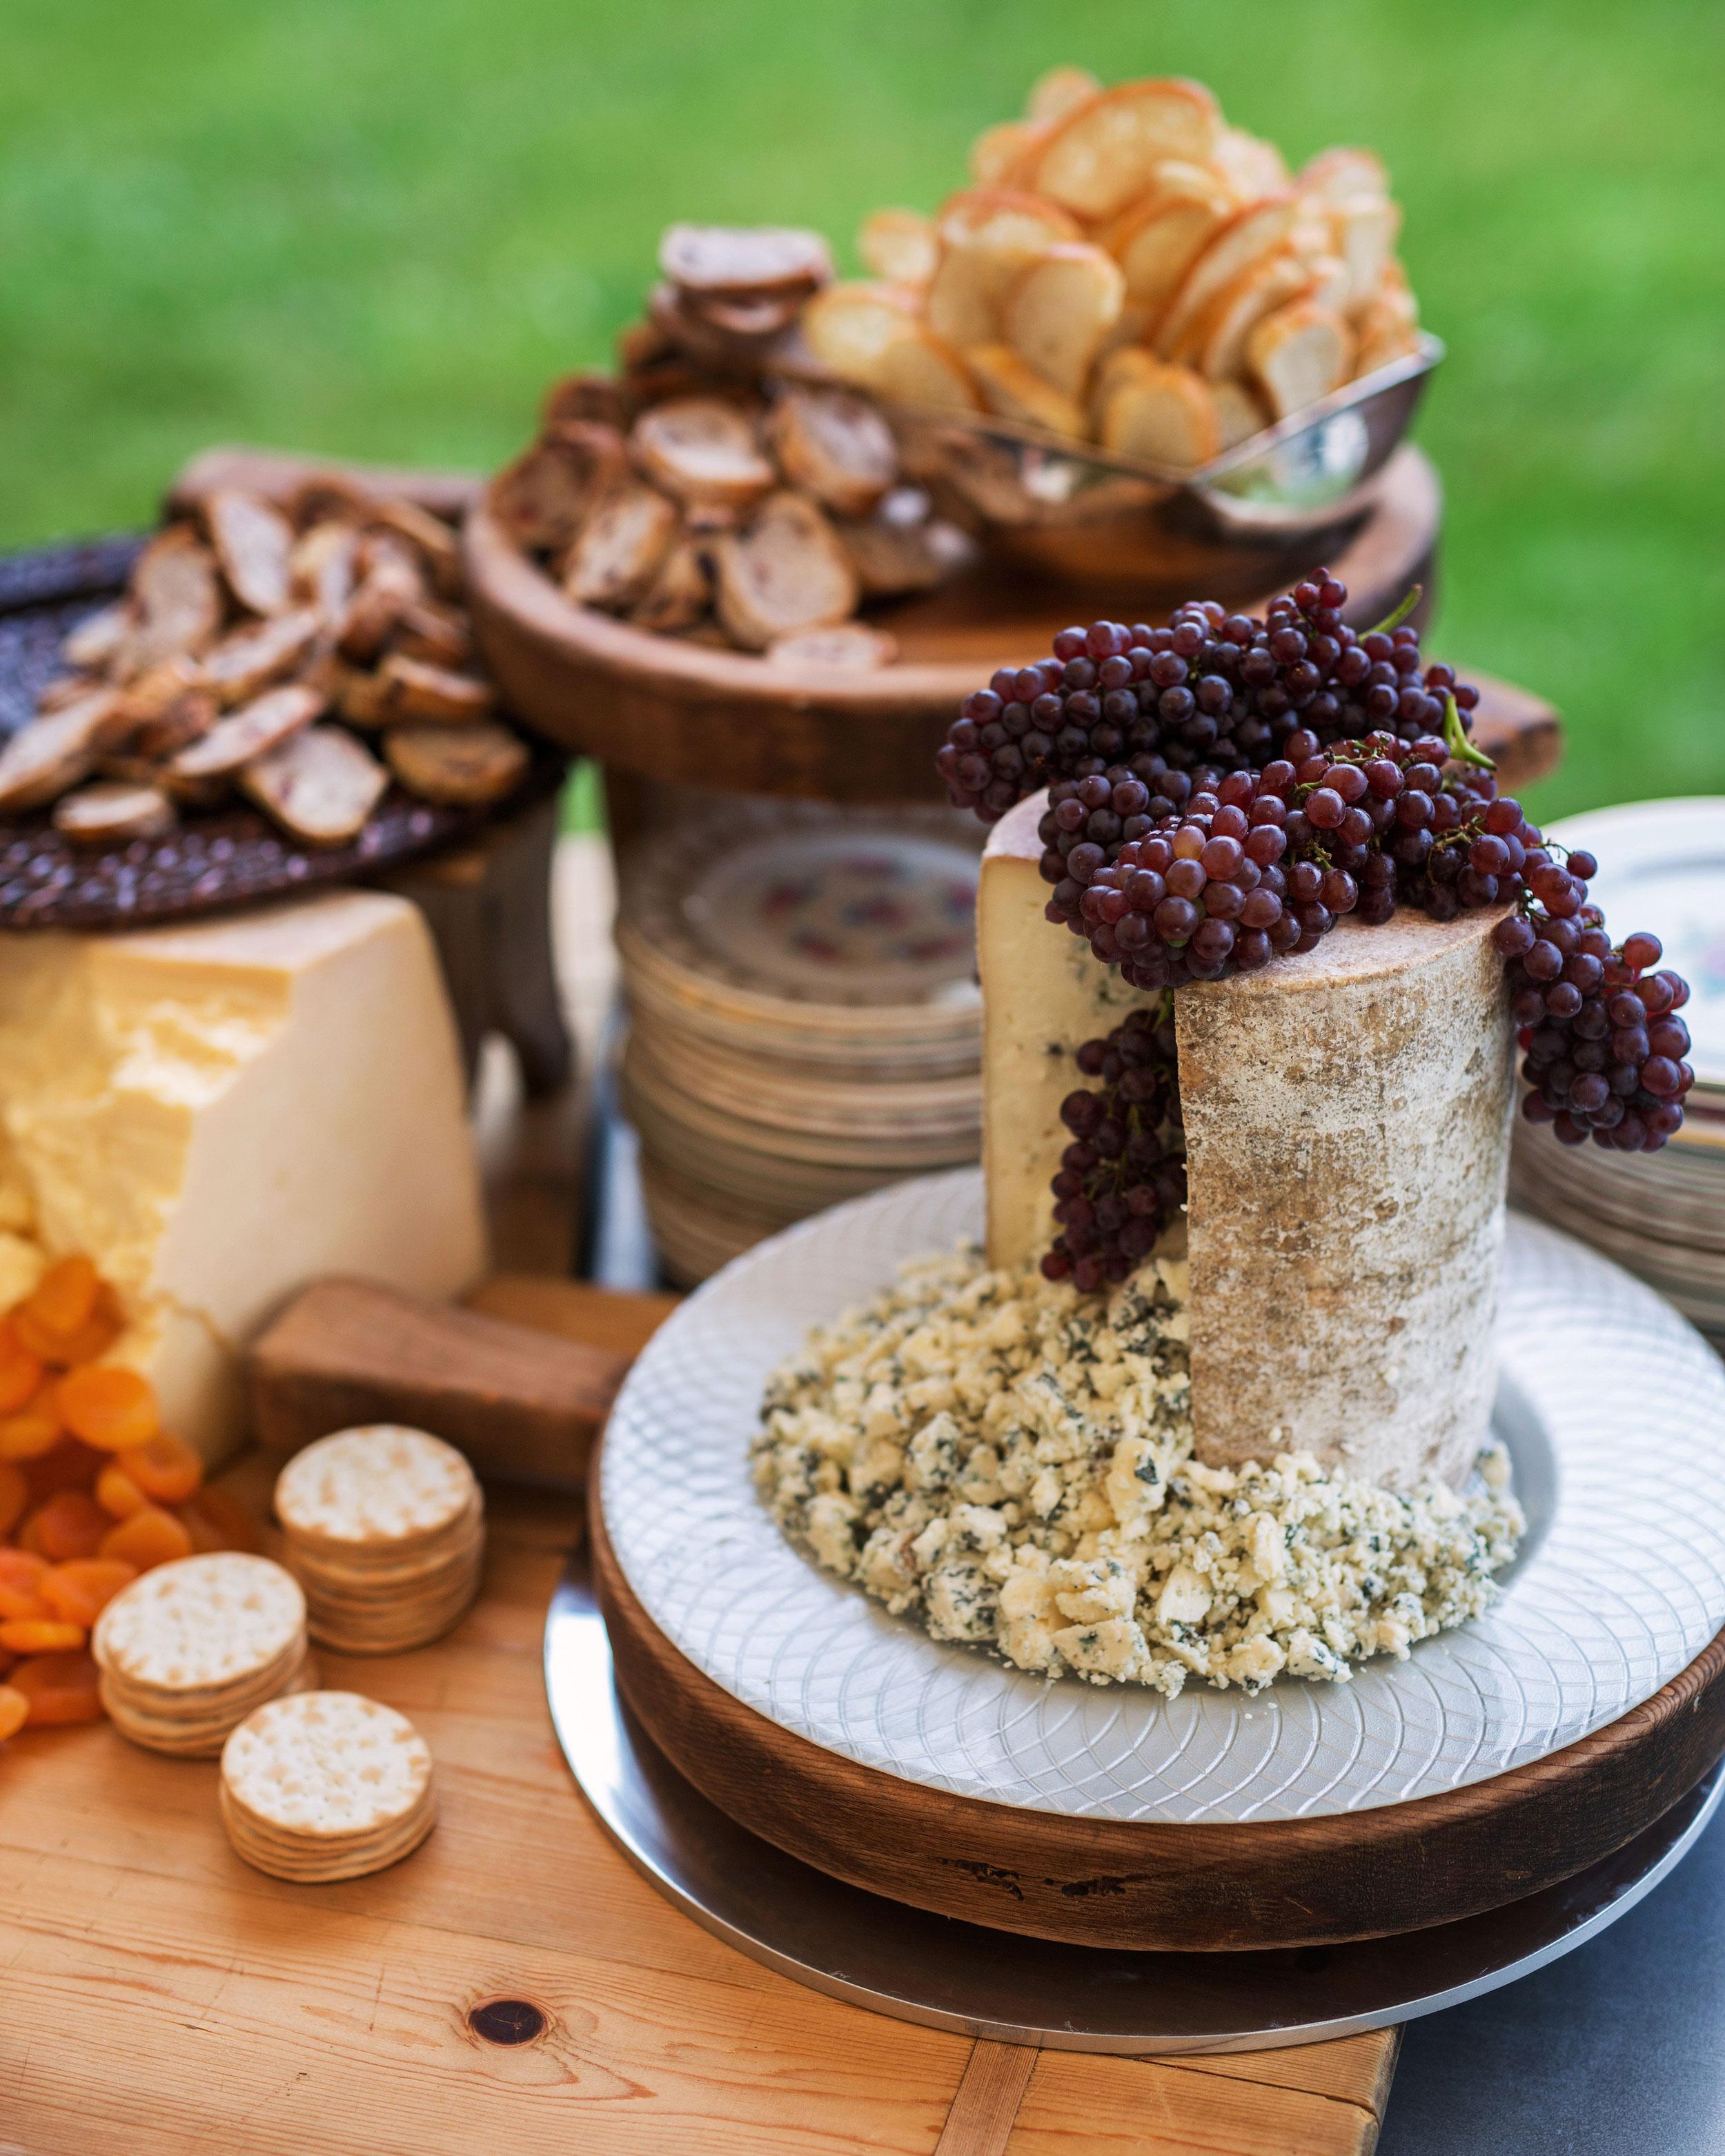 kaitlyn-robert-wedding-cheese-0231-s112718-0316.jpg